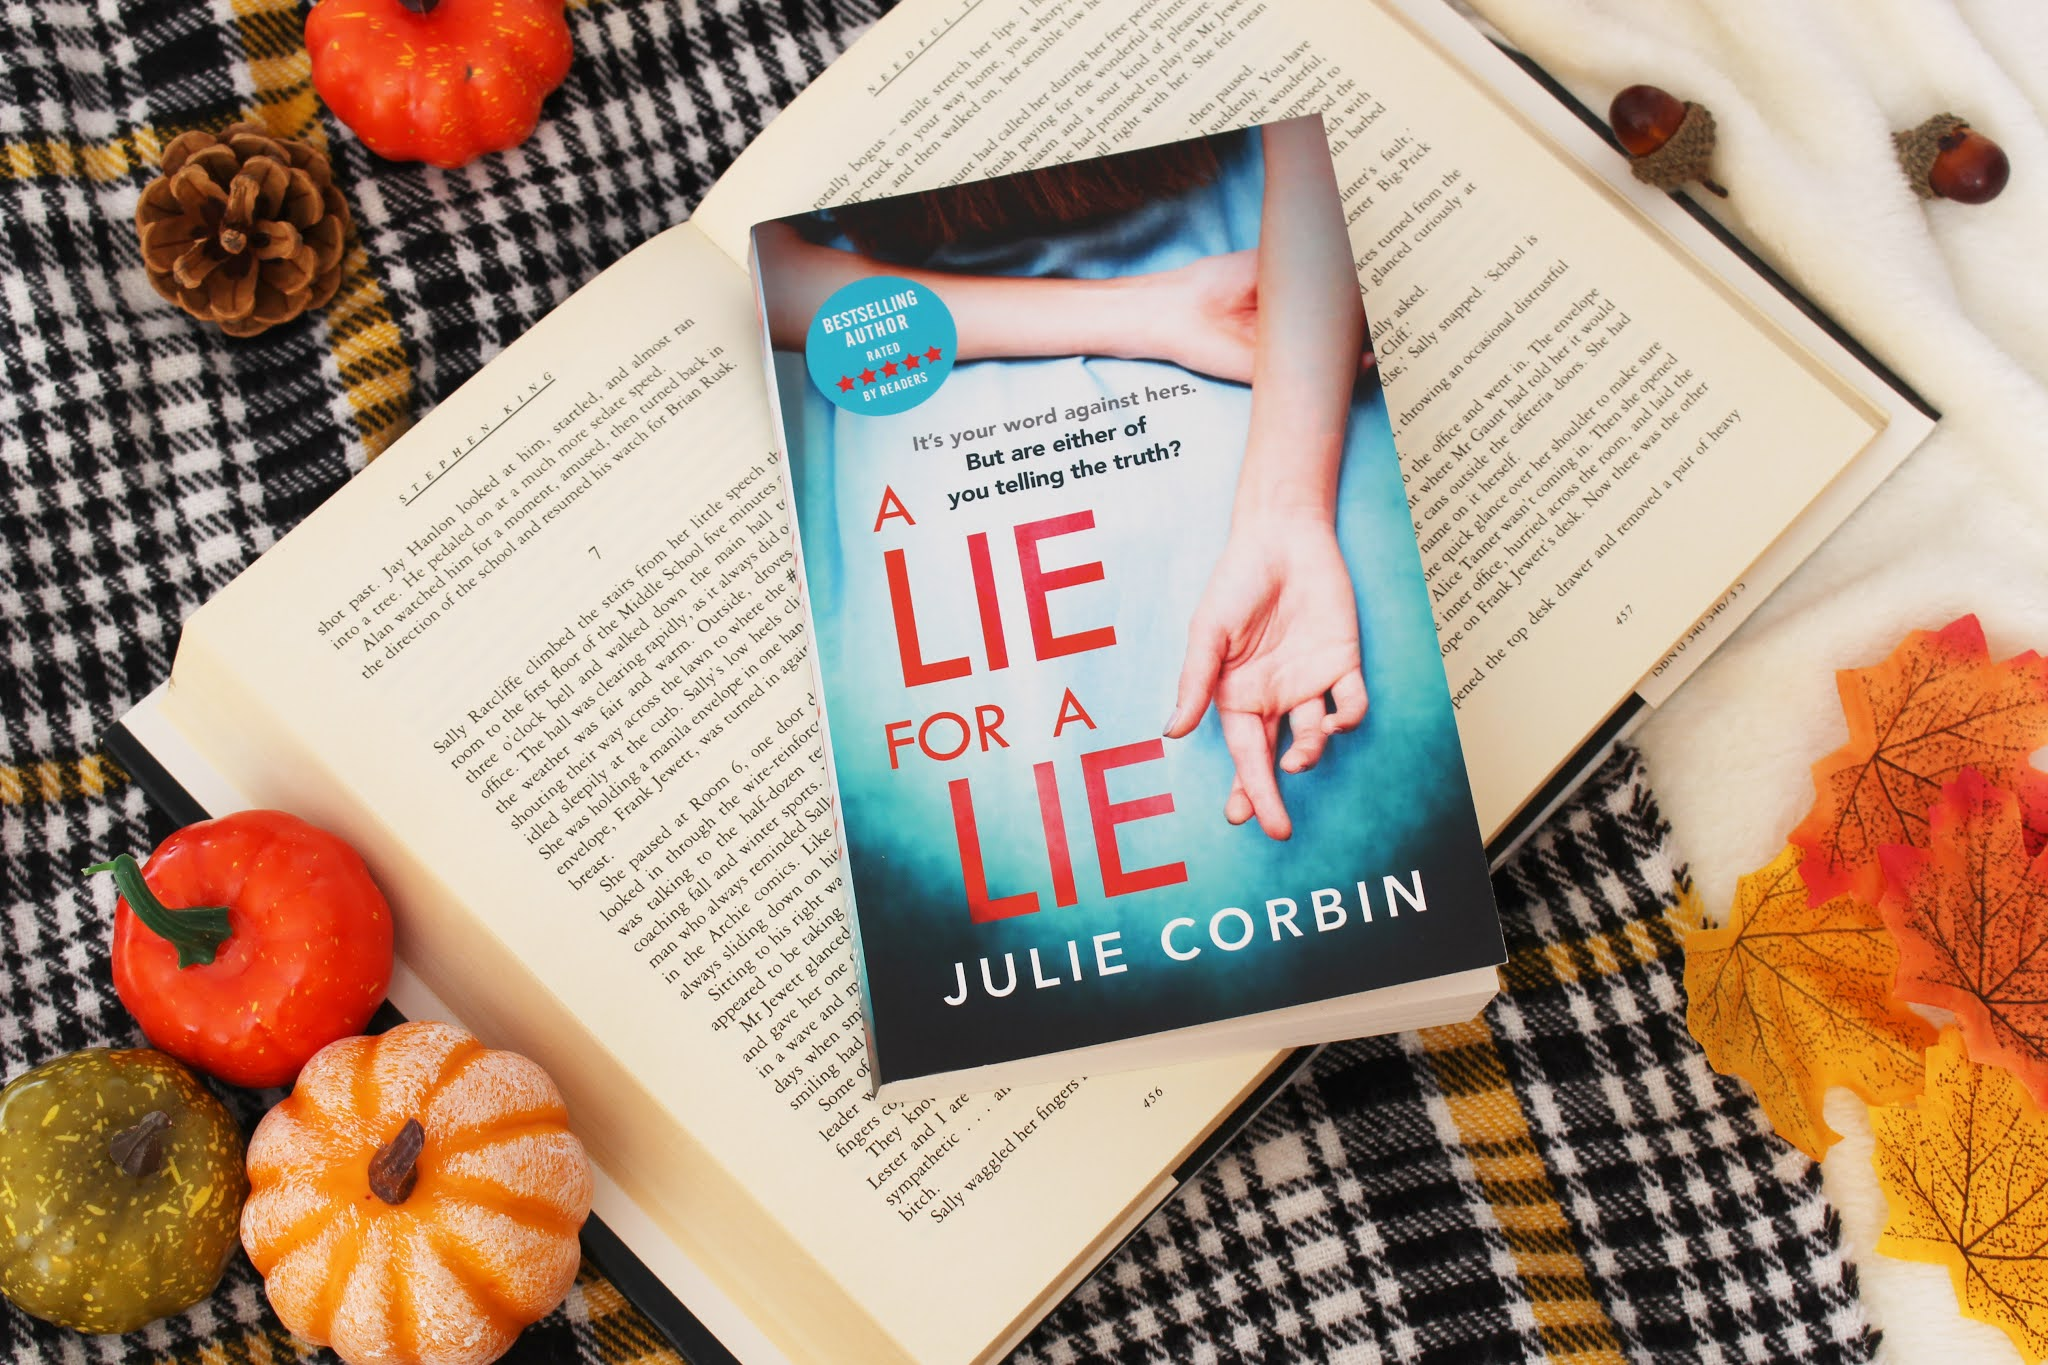 A Lie For A Lie By Julie Corbin | Book Review